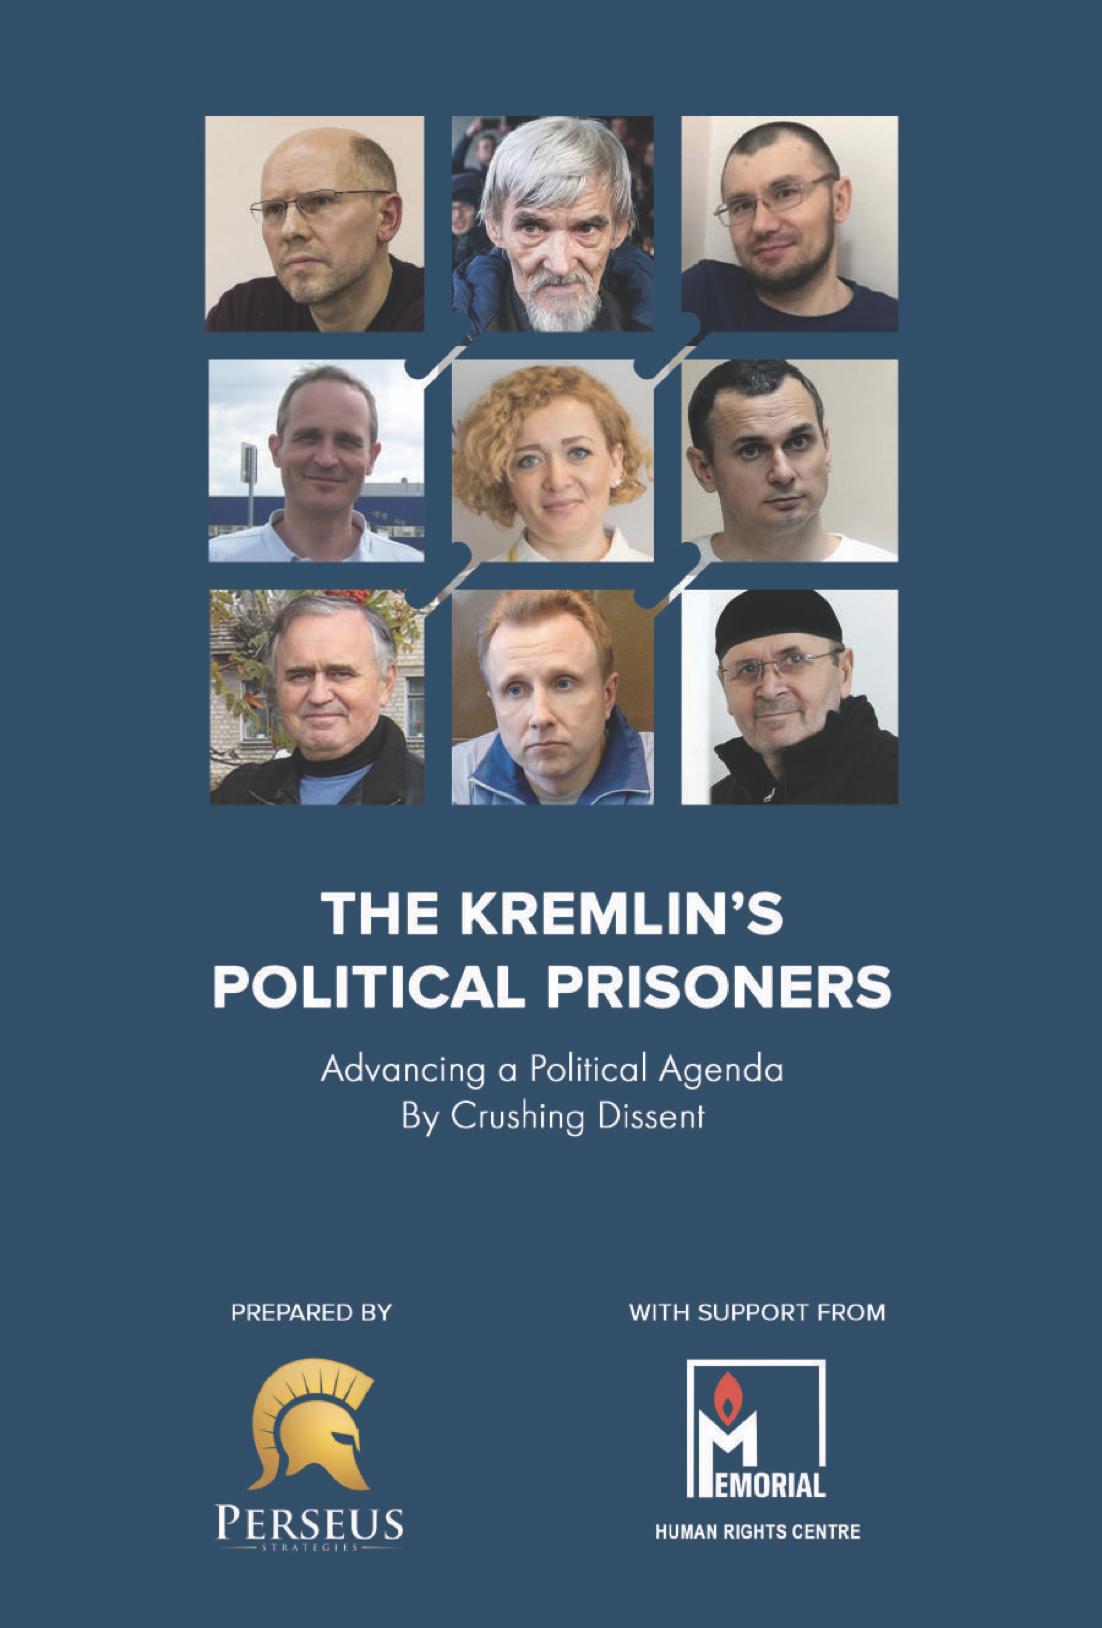 The Kremlin's Political Prisoners_Report.png